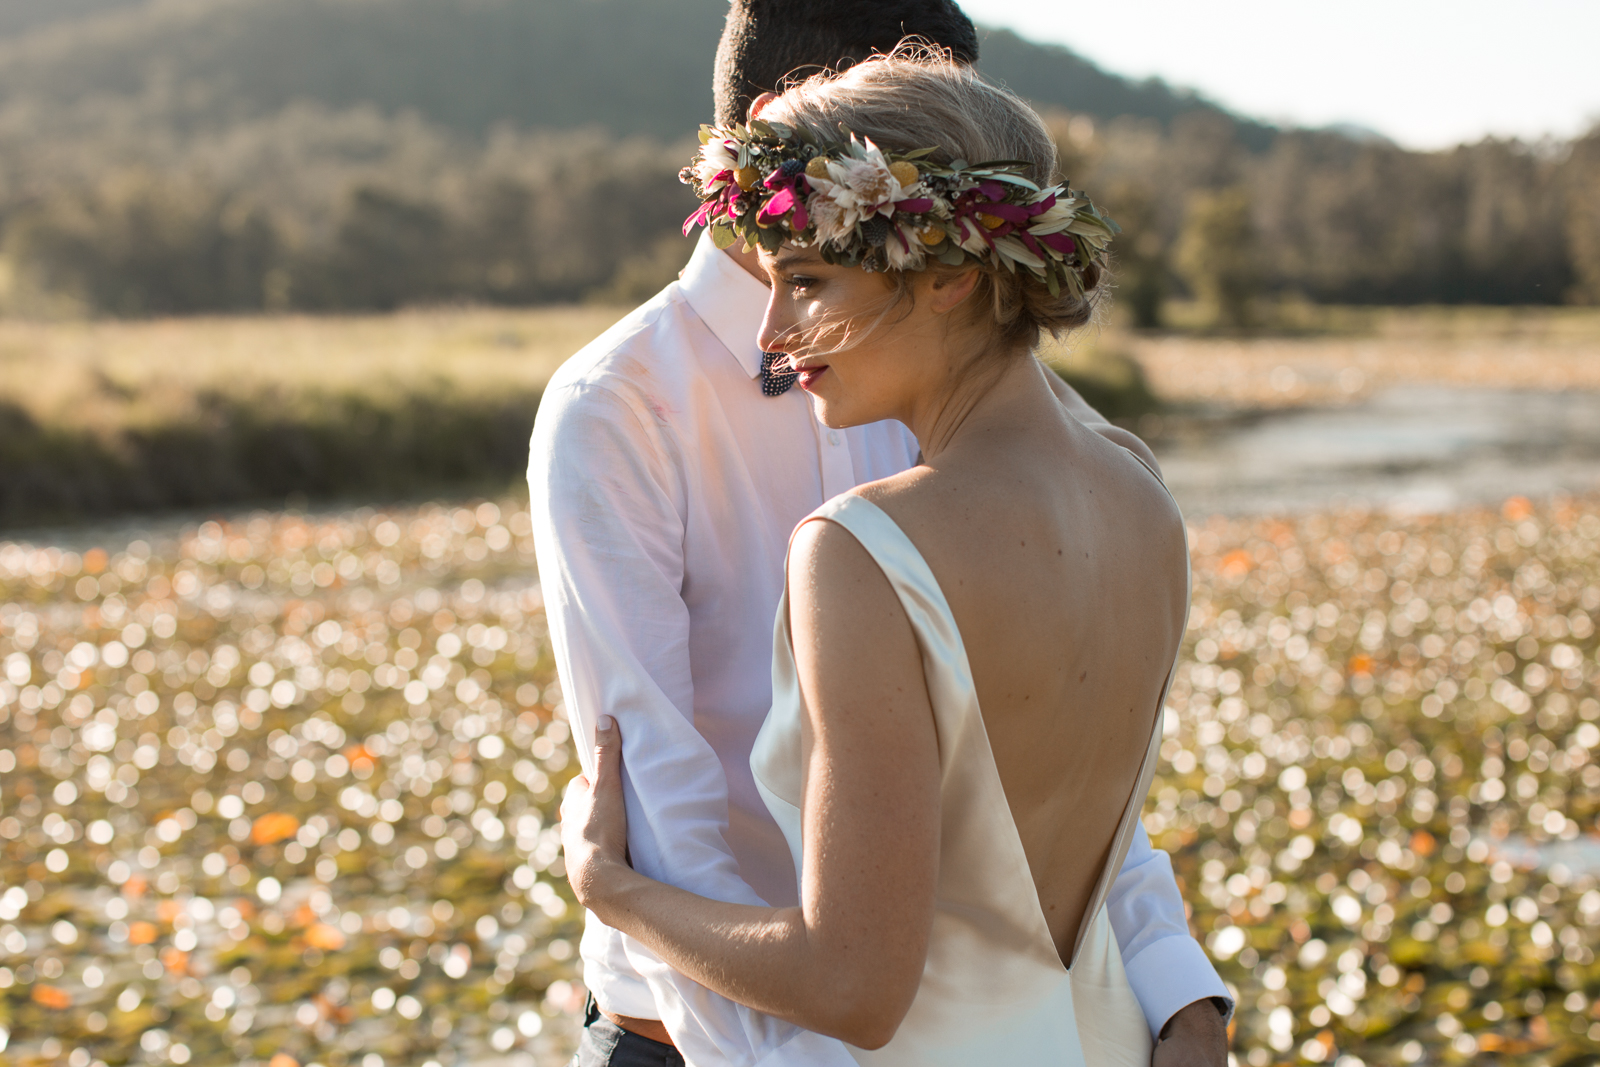 112Bec_Kilpatrick_Photography_Jess_and_Kion_Uki_Wedding_Portraits-978922